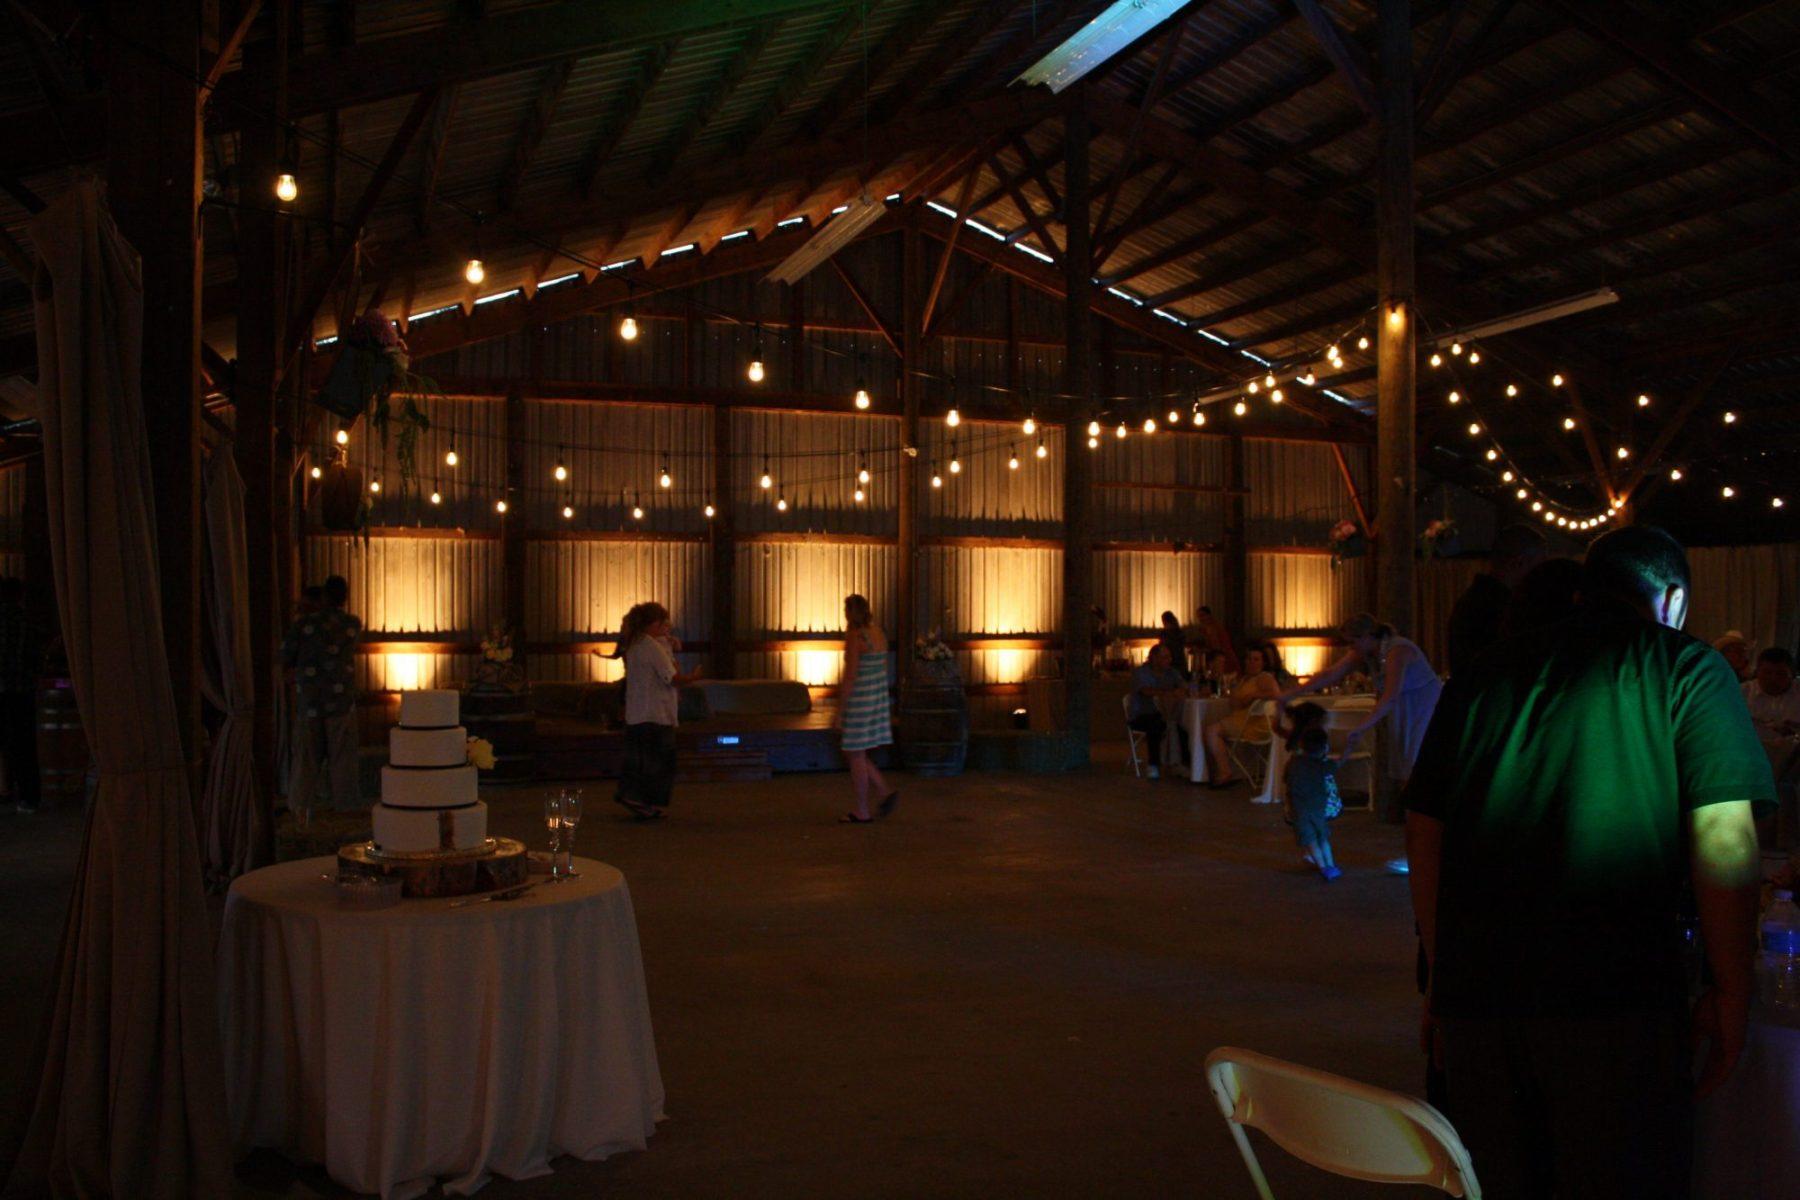 barn wedding lighting. Herald Barn Wedding Lighting And Market Lights R